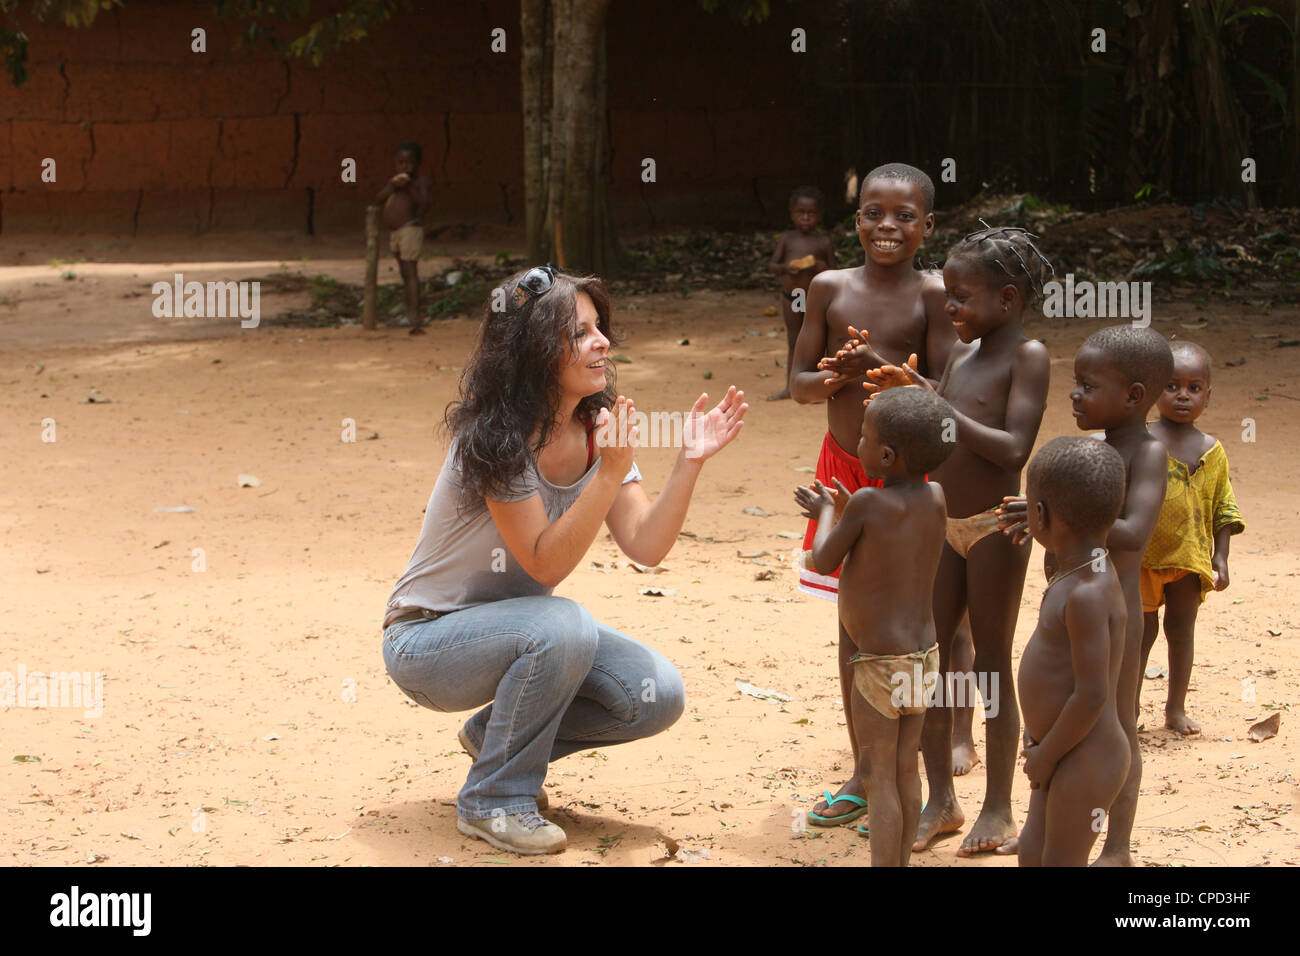 African Children Playing Africa Stock Photos & African Children